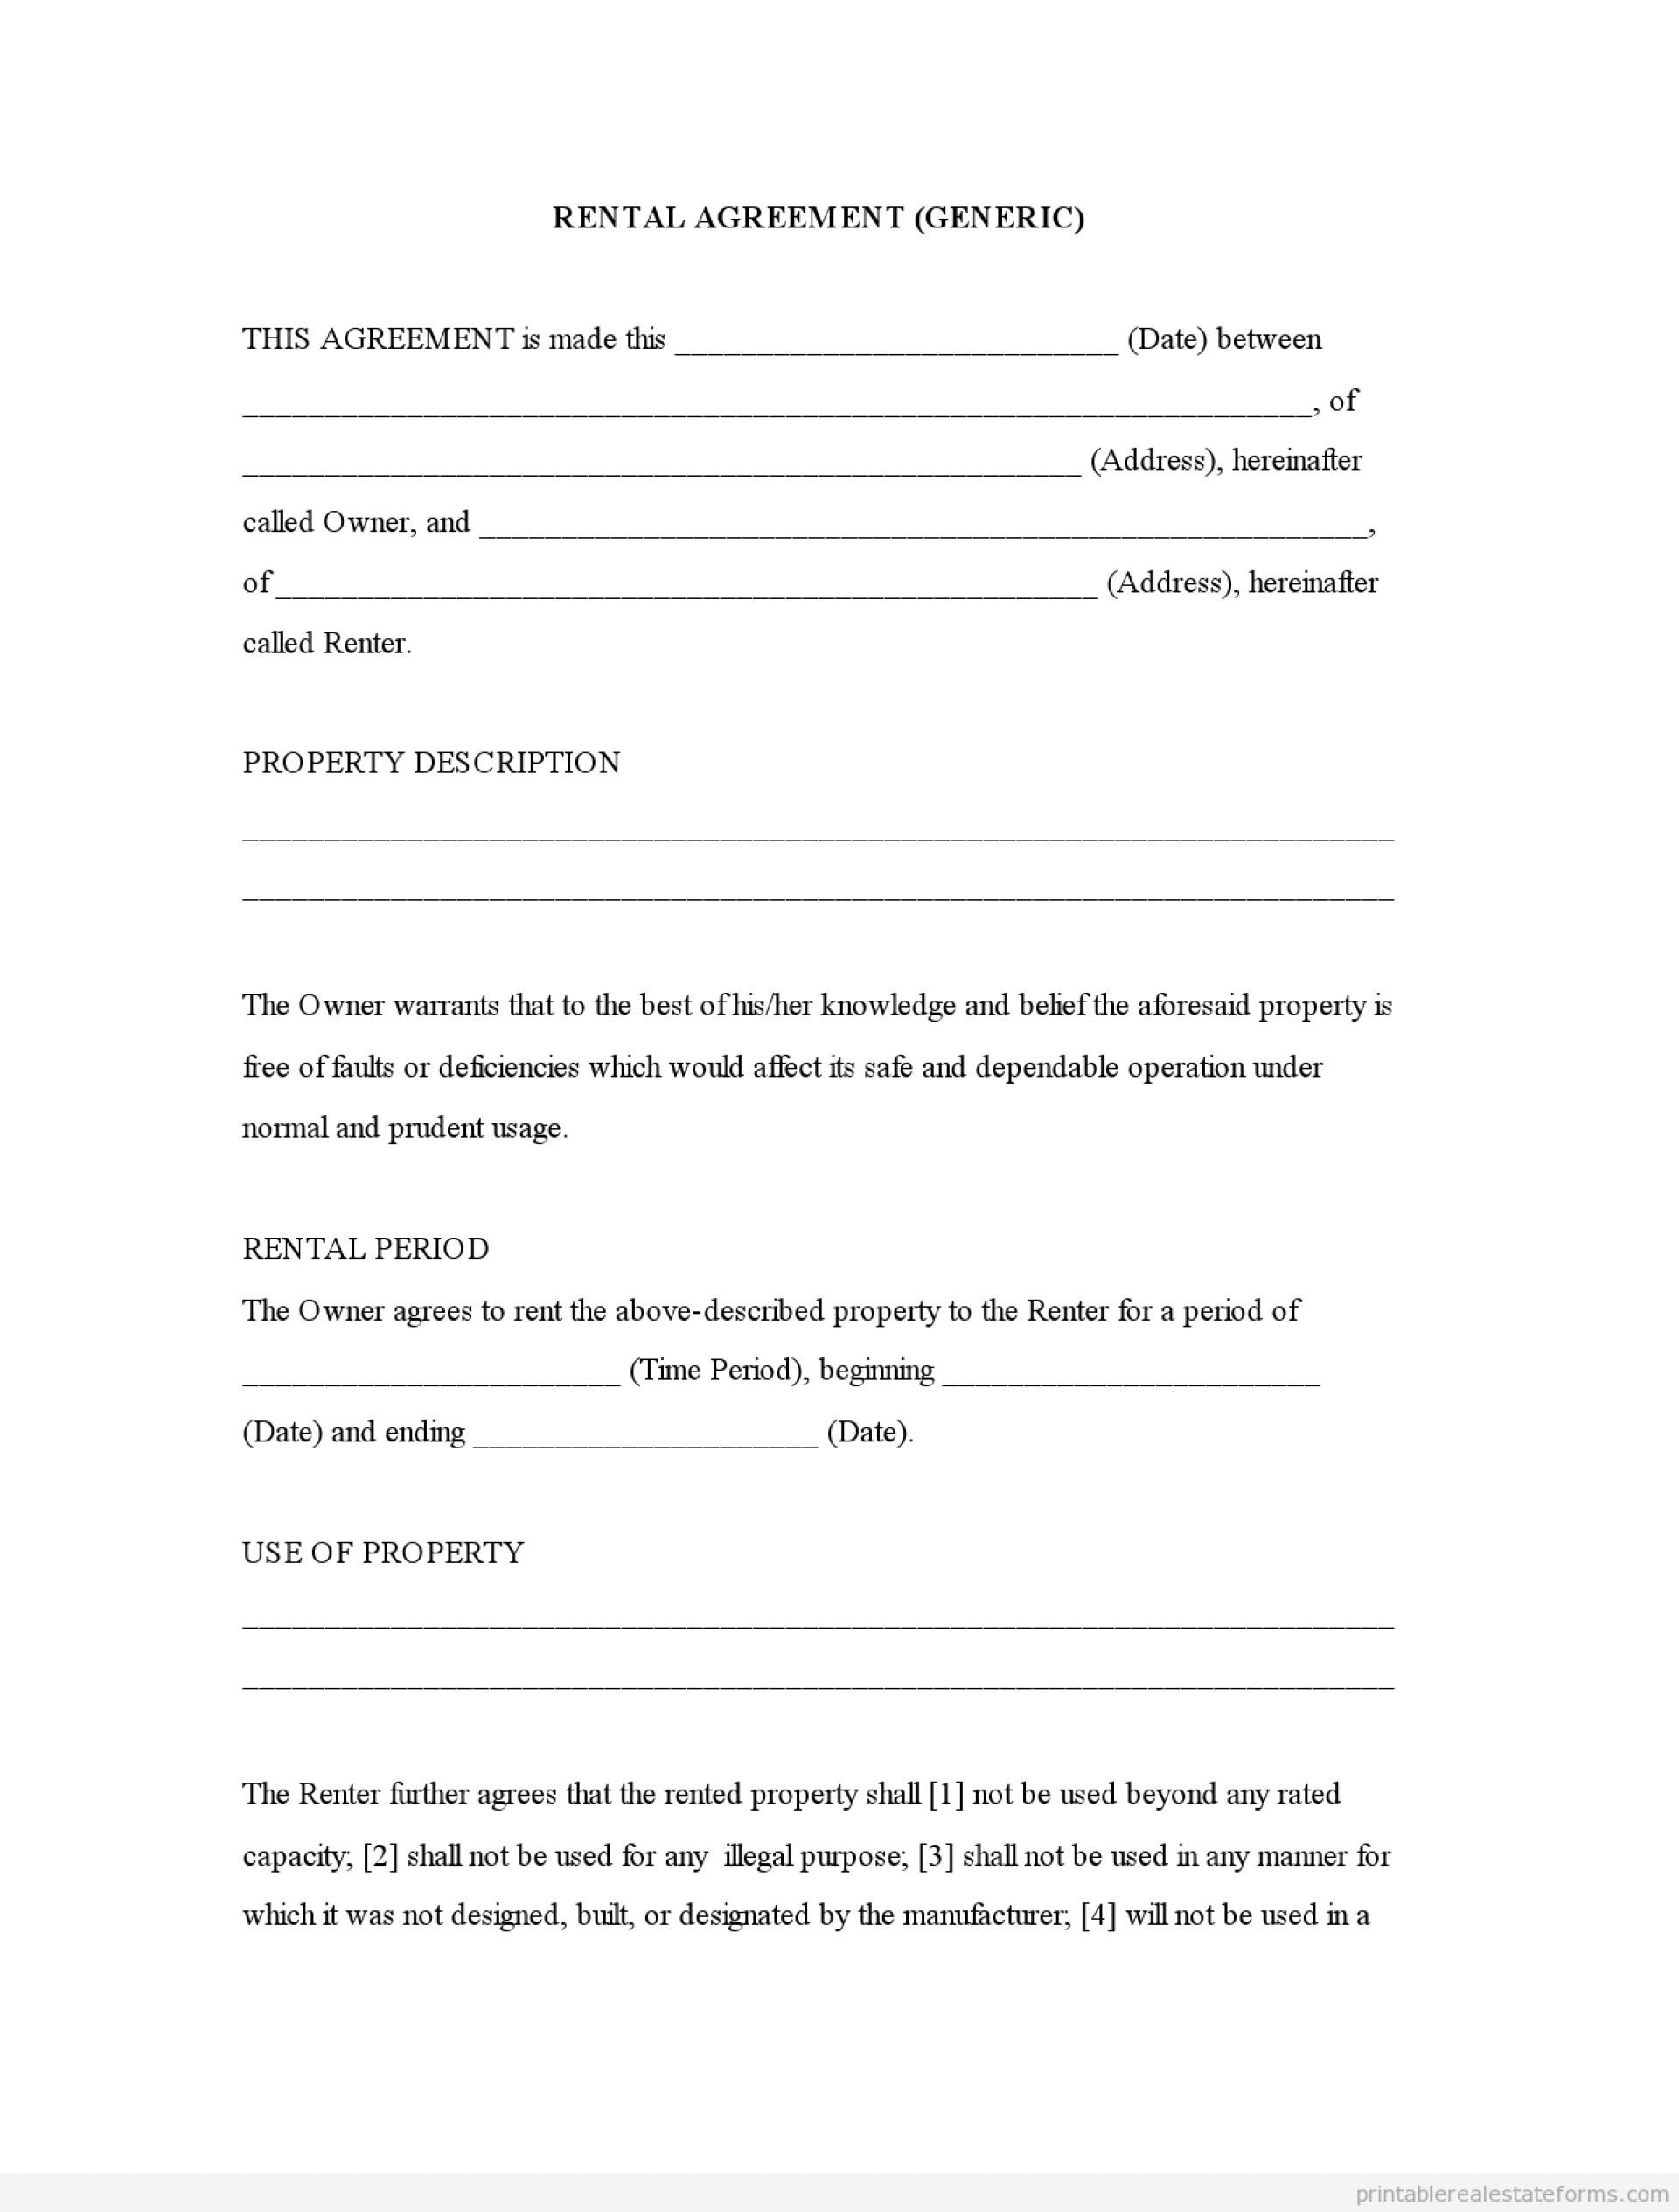 008 Free Printable Basic Rental Agreement Lease Form Template Ideas - Rental Agreement Forms Free Printable